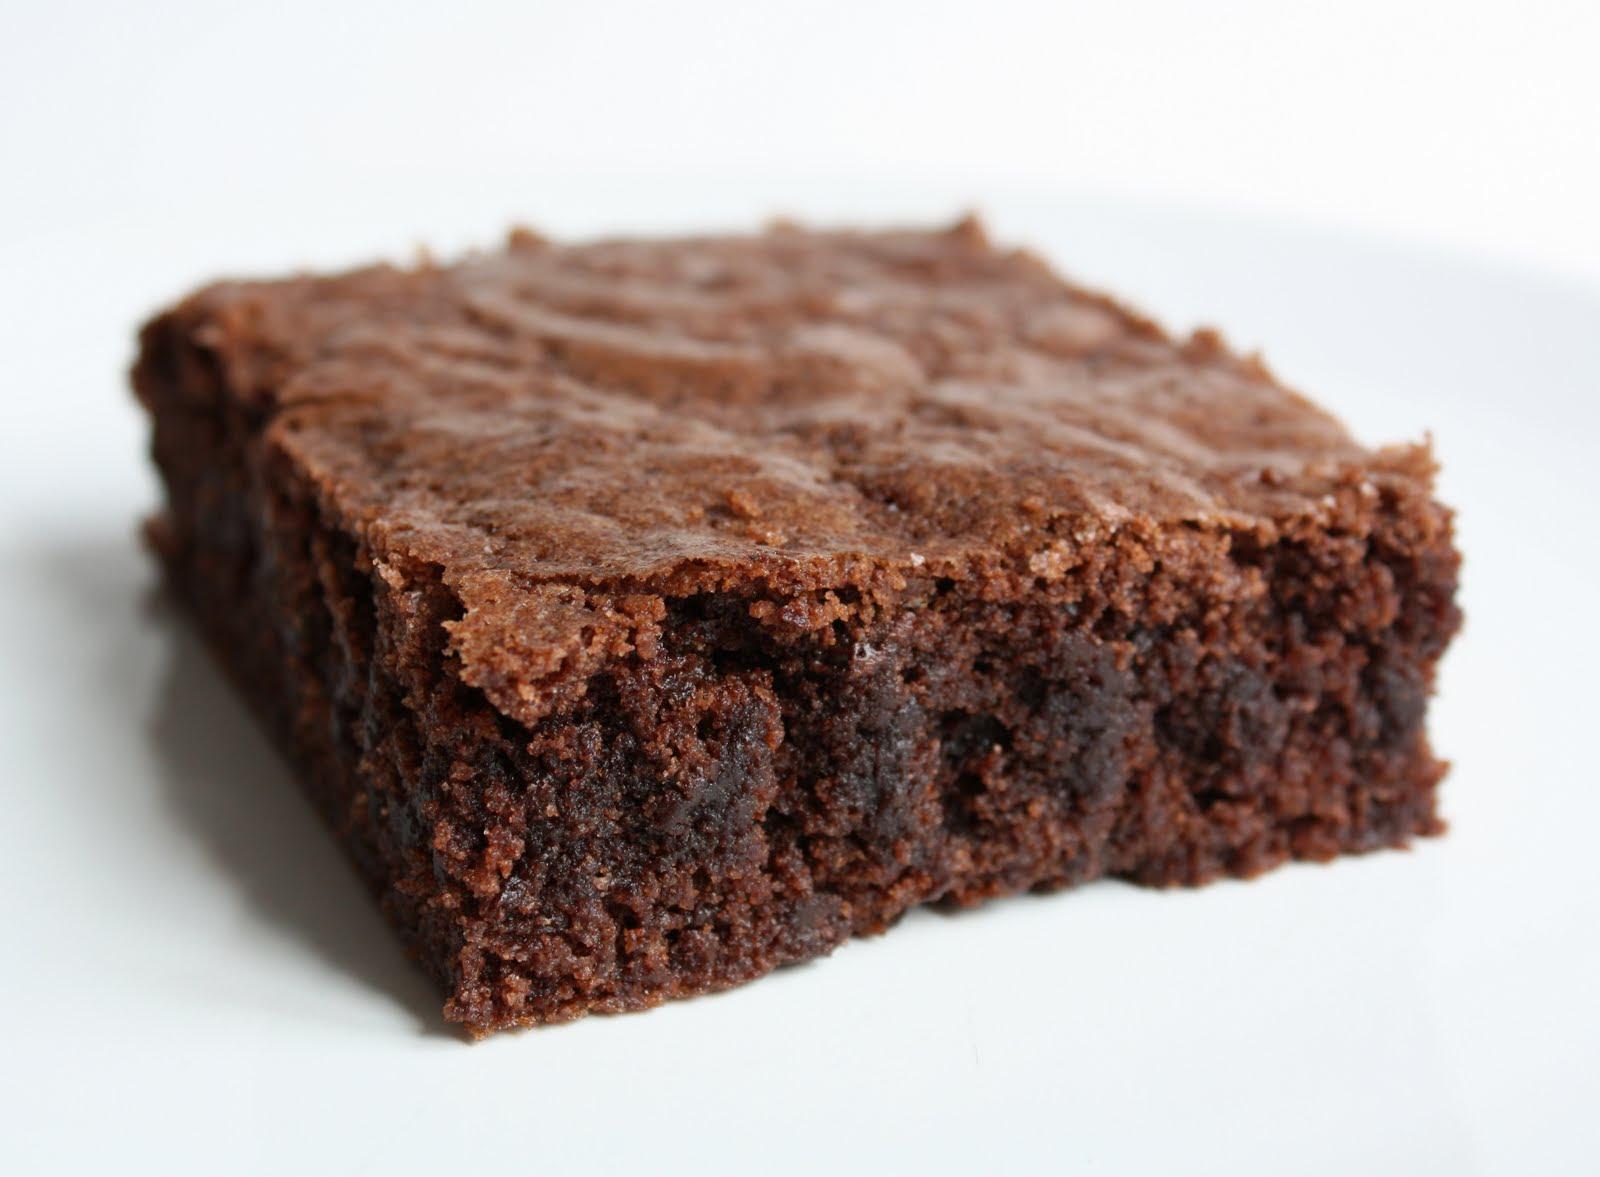 http://milrecetas.net/wp-content/uploads/2016/01/Brownie-de-chocolate-2.jpg